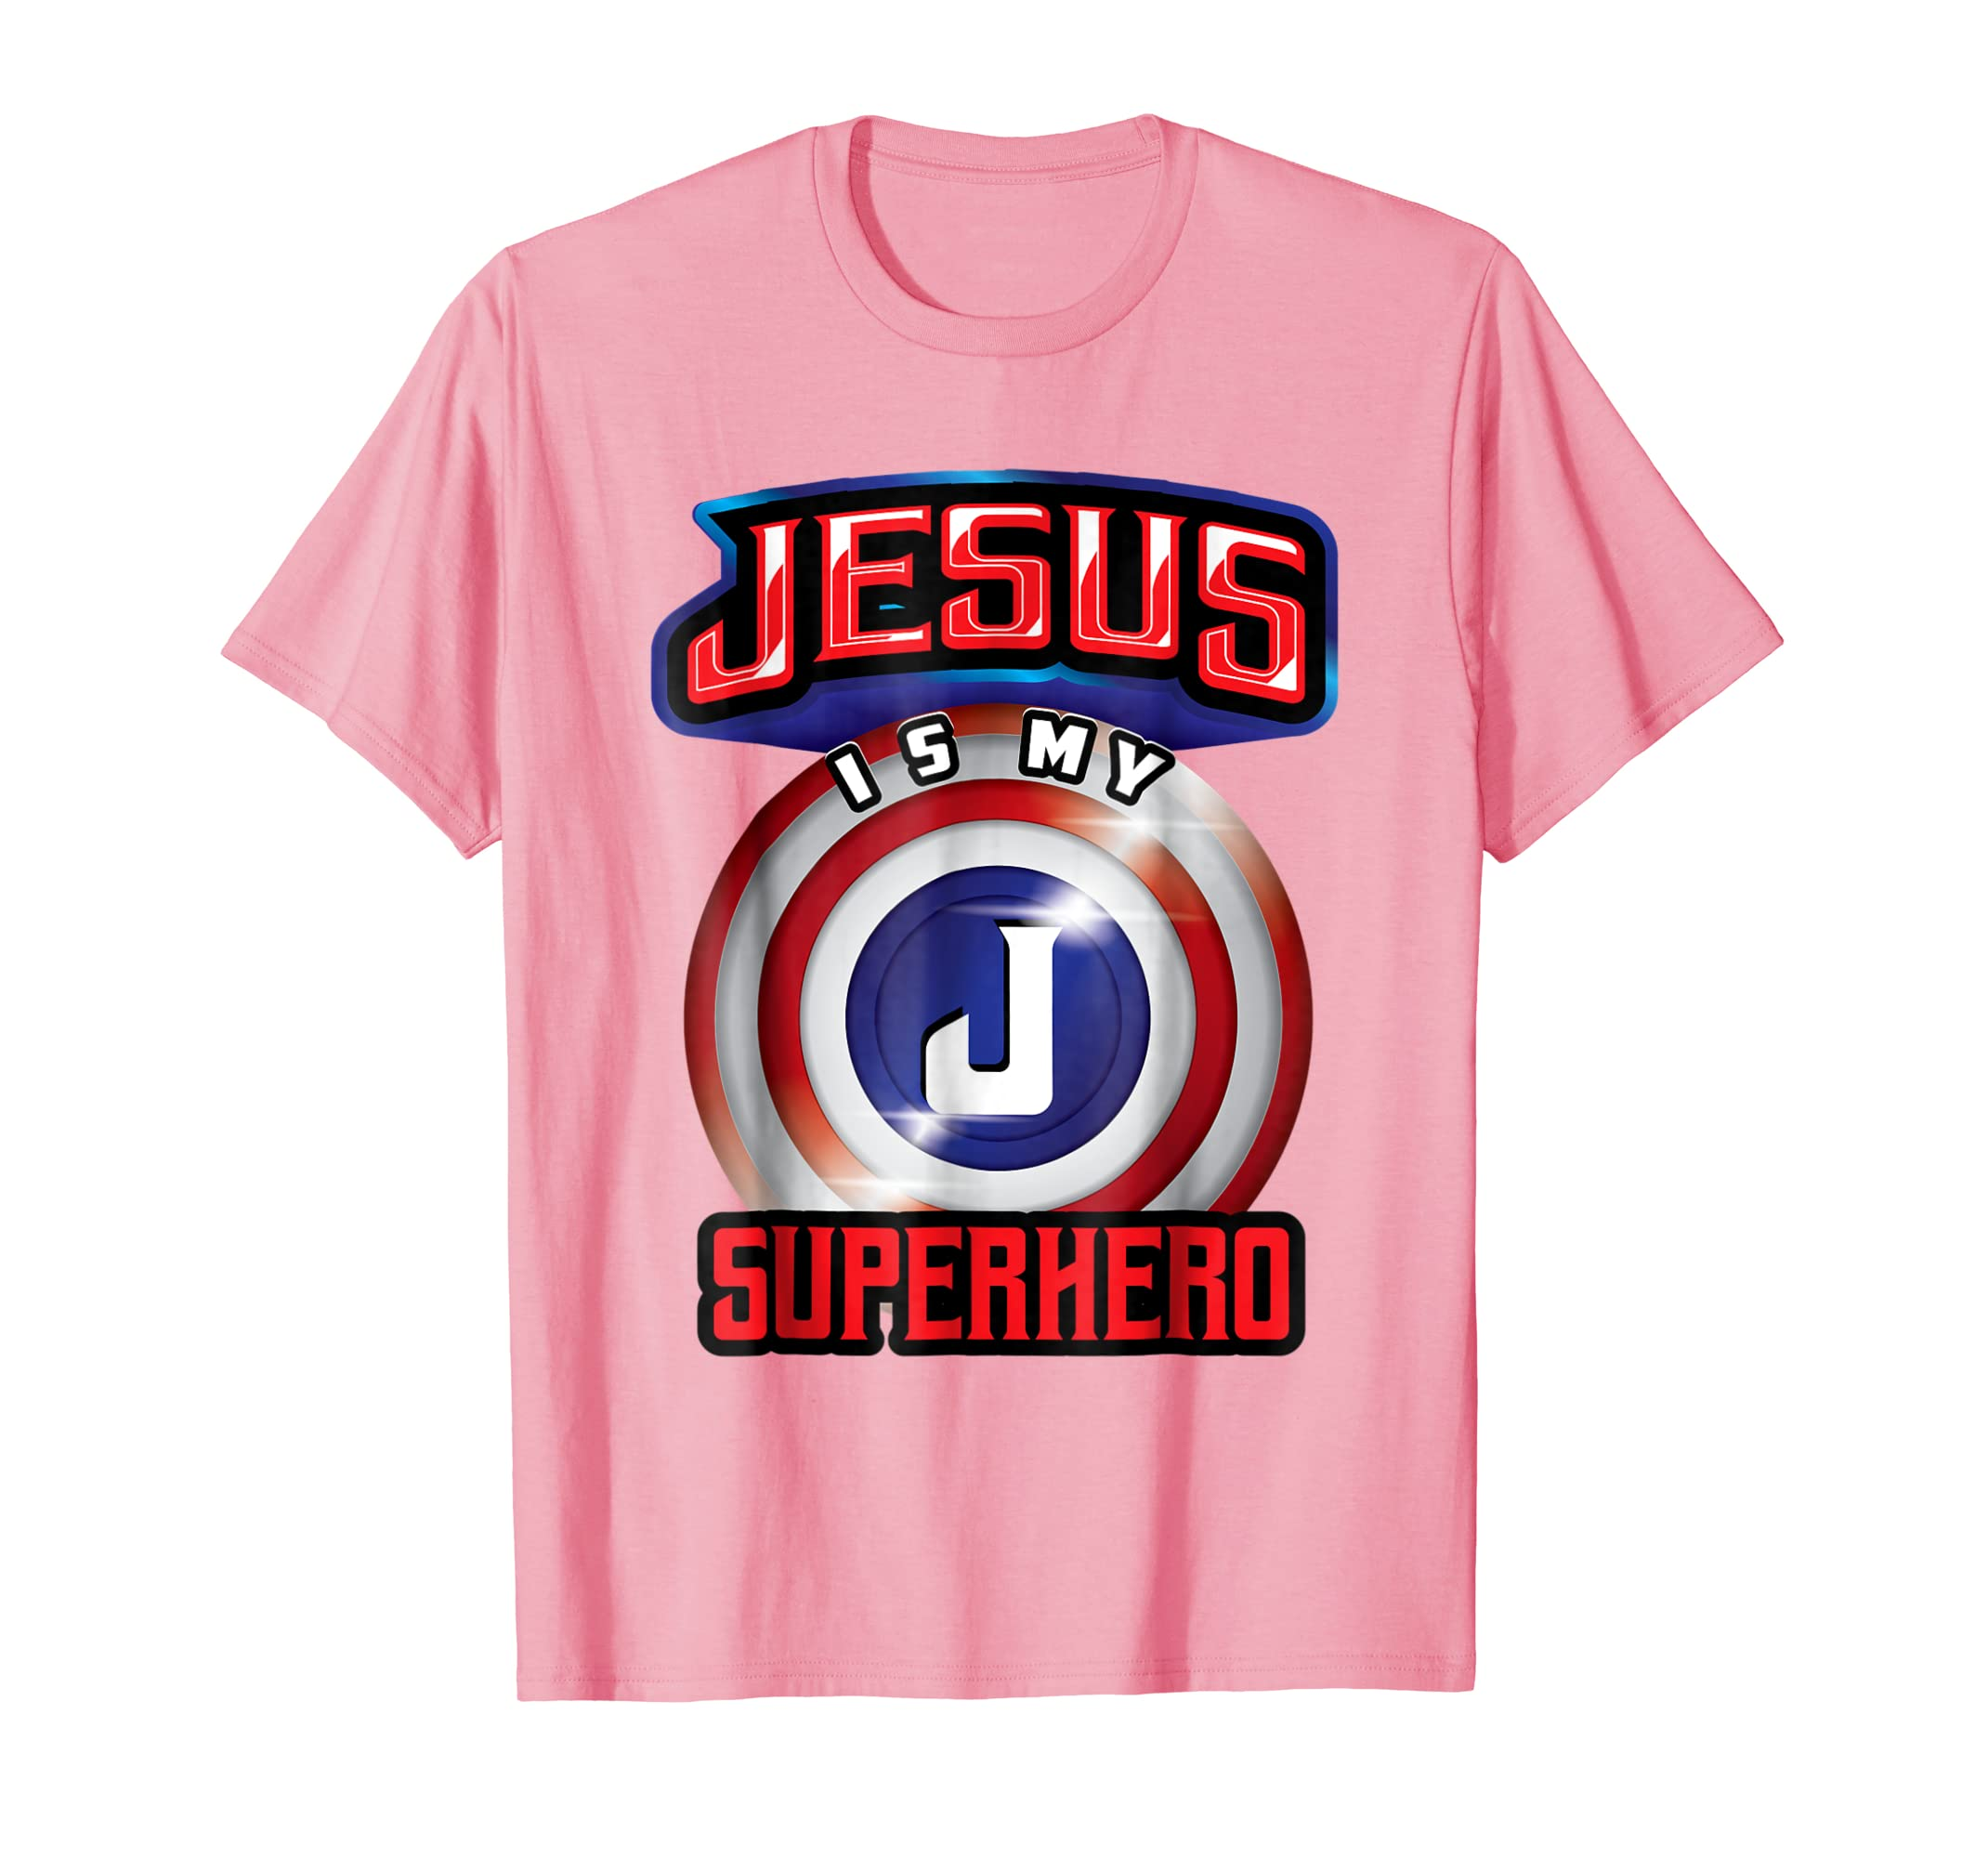 Amazon.com: Jesus Is My Superhero Shirt | Cute Powerful Christian ...